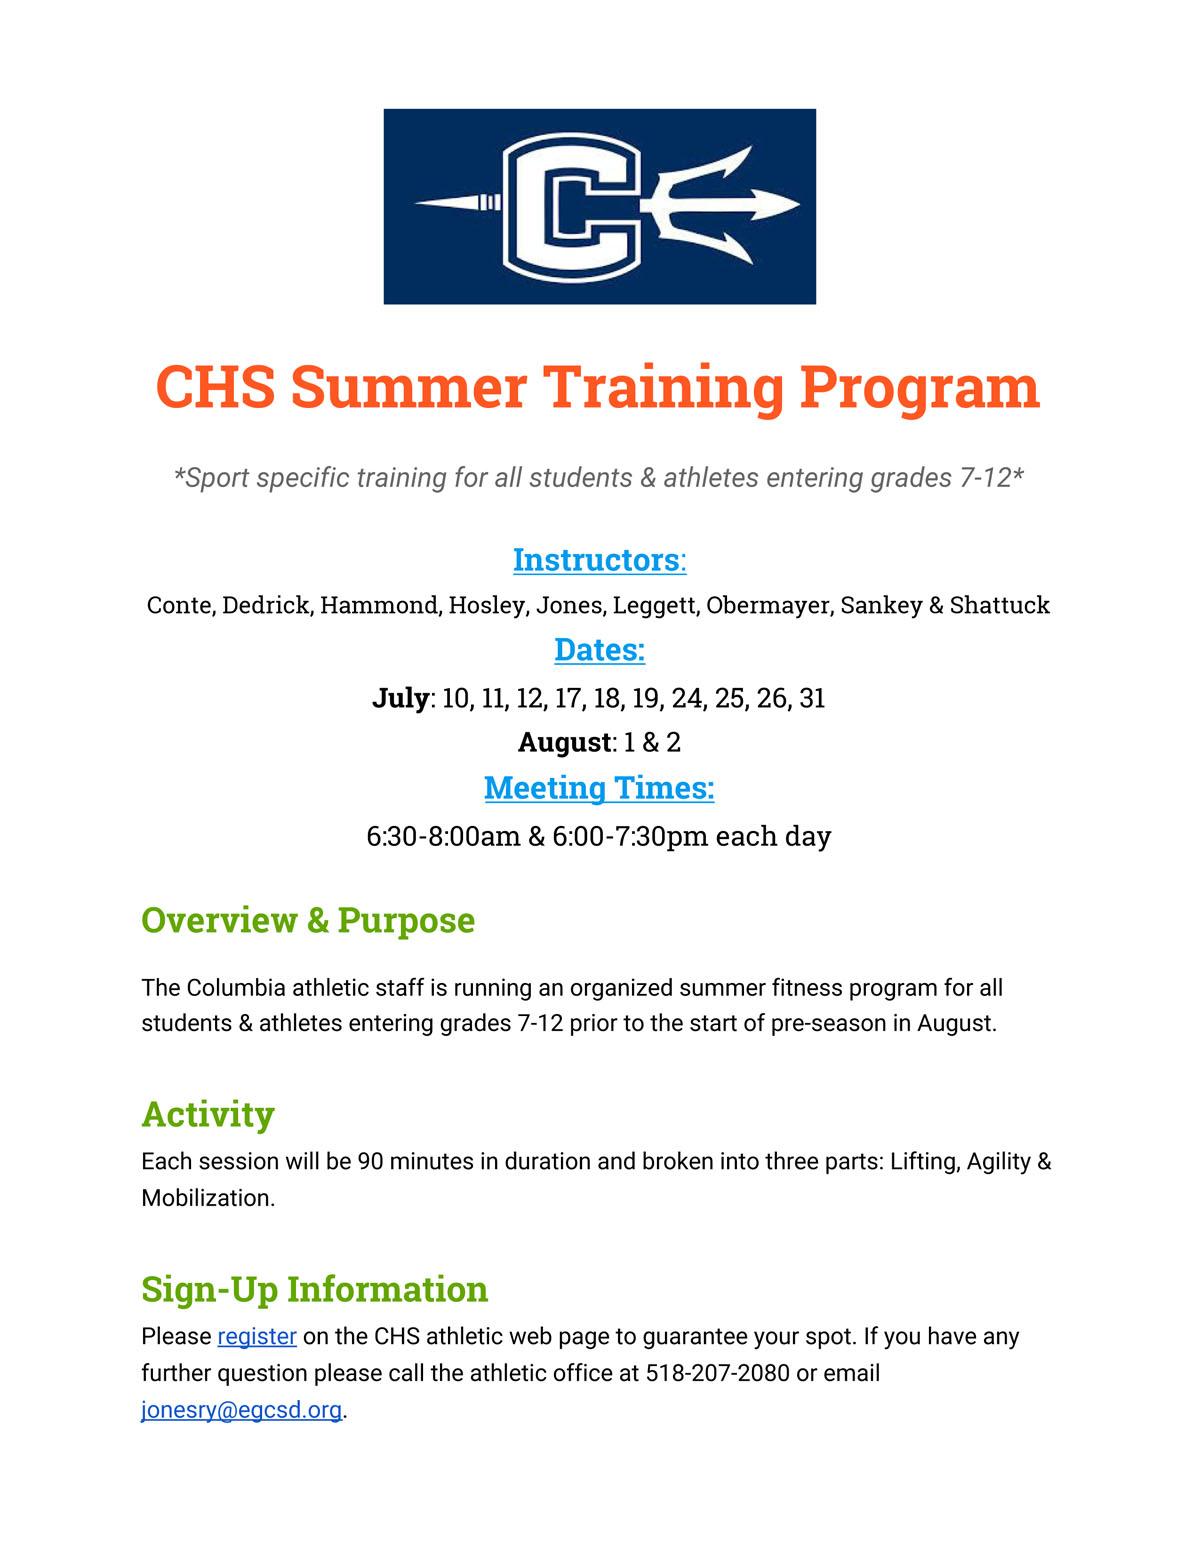 CHS Summer Fitness Training Flyer